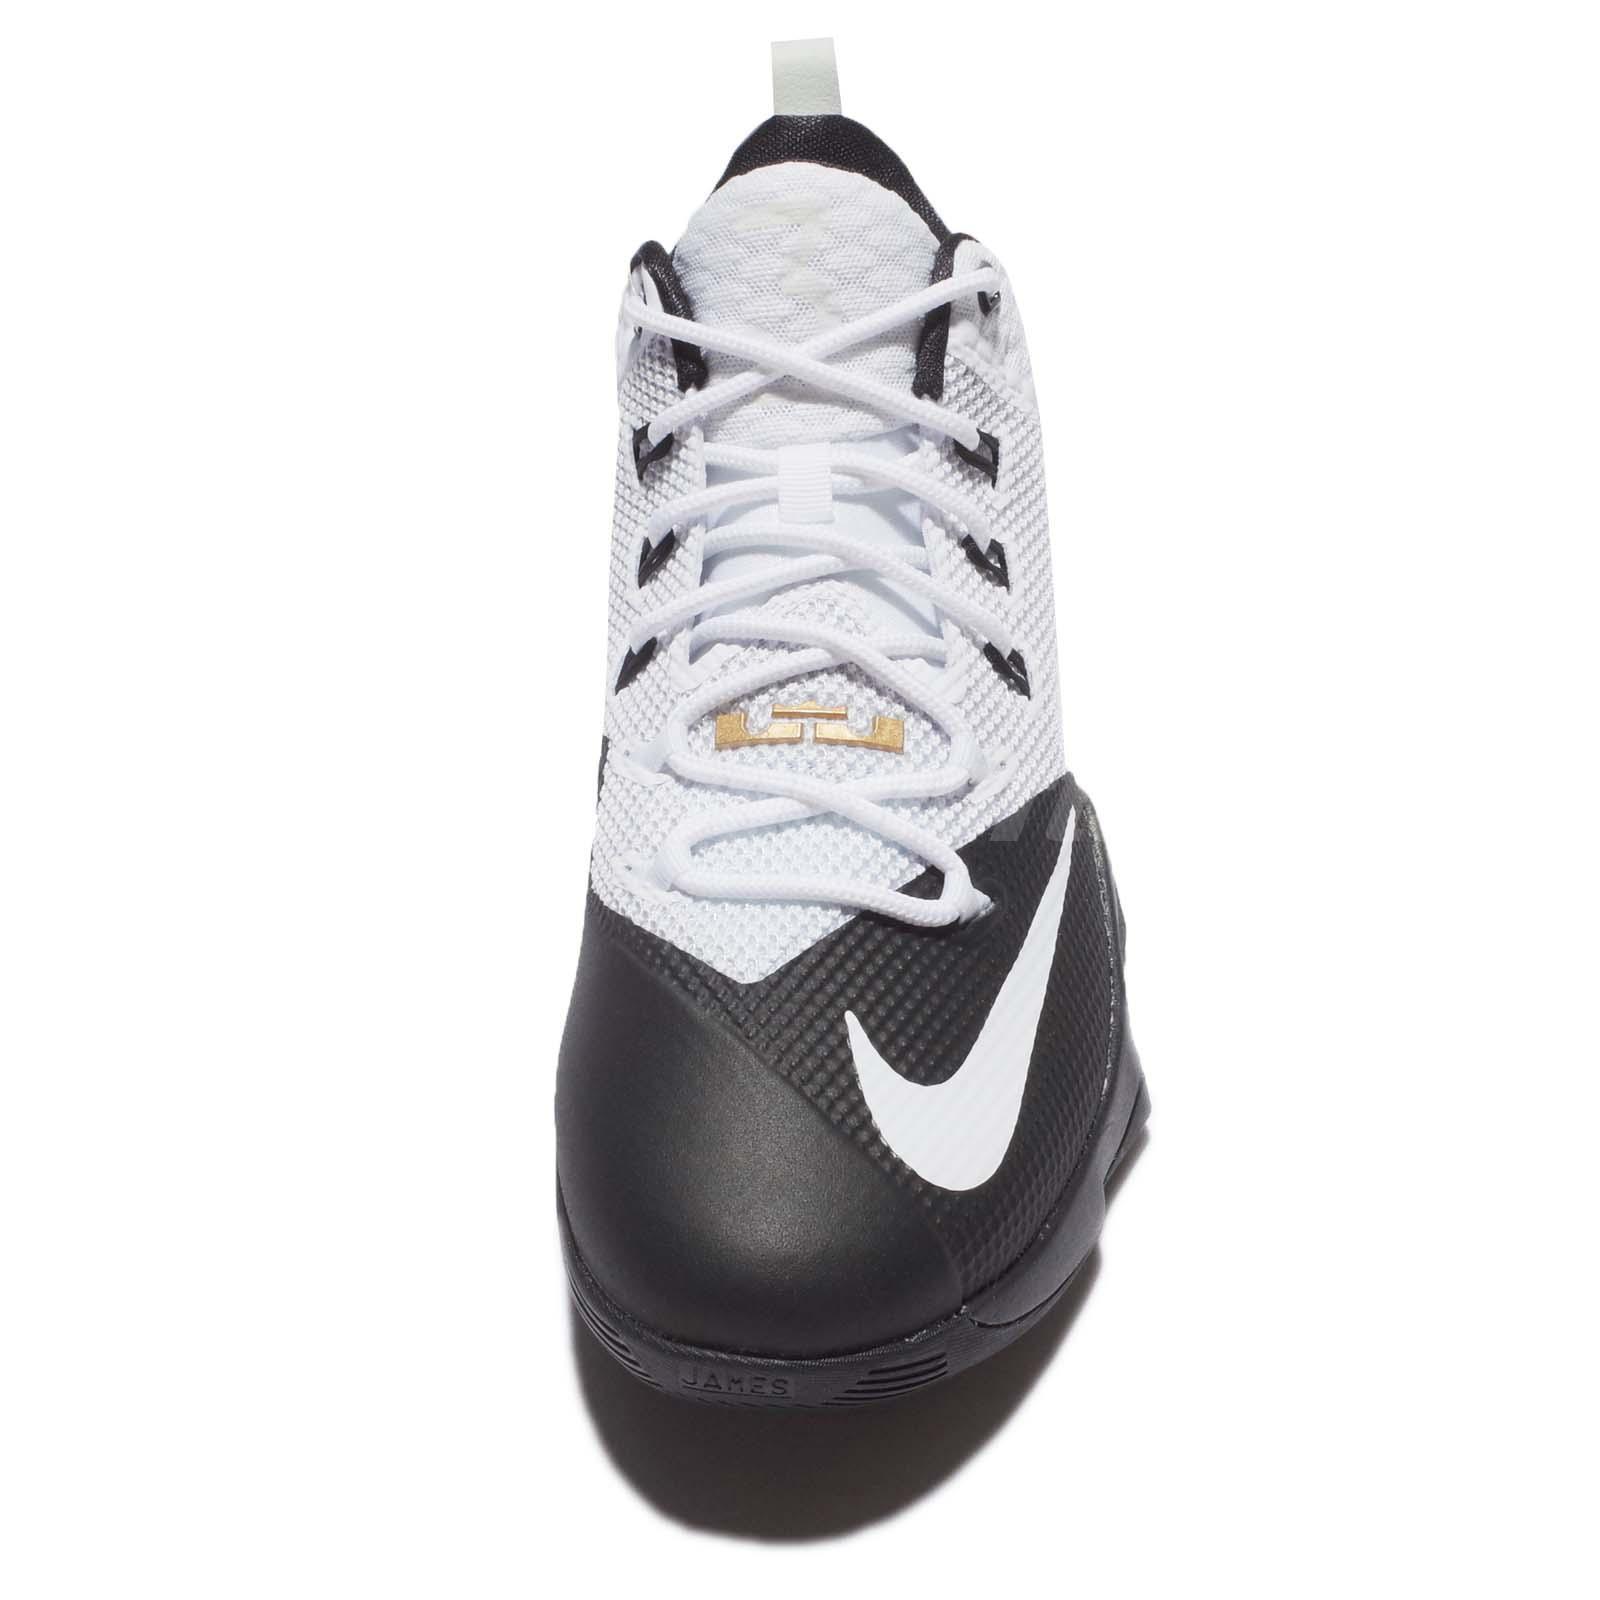 online retailer 0fd4b ad11c Nike LeBron Ambassador IX – White-Gold – Front